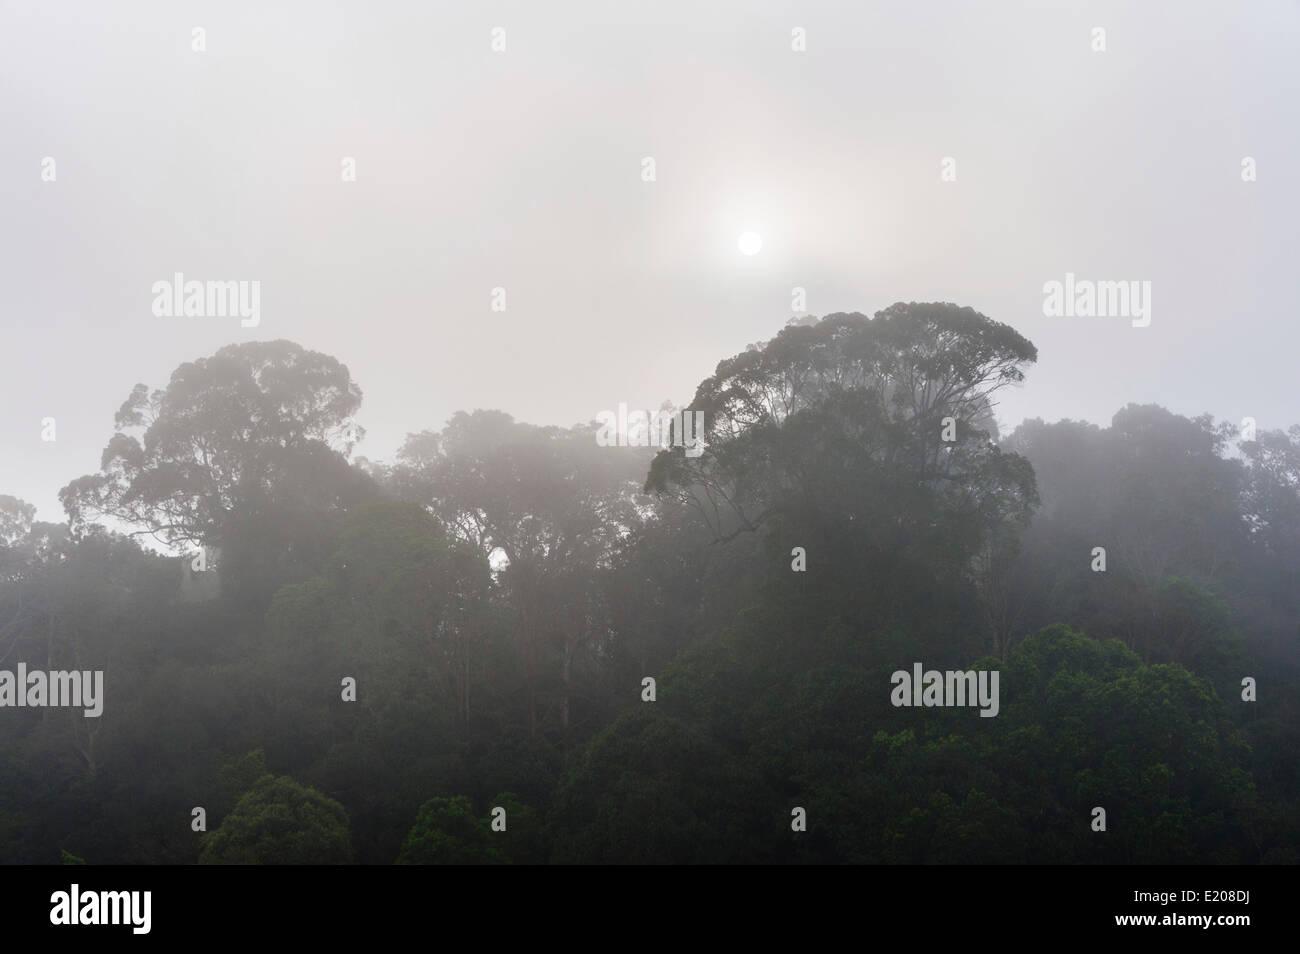 Selva en la niebla, siluetas de árboles, Periyar Dam, Thekkadi, Tamil Nadu, India Imagen De Stock